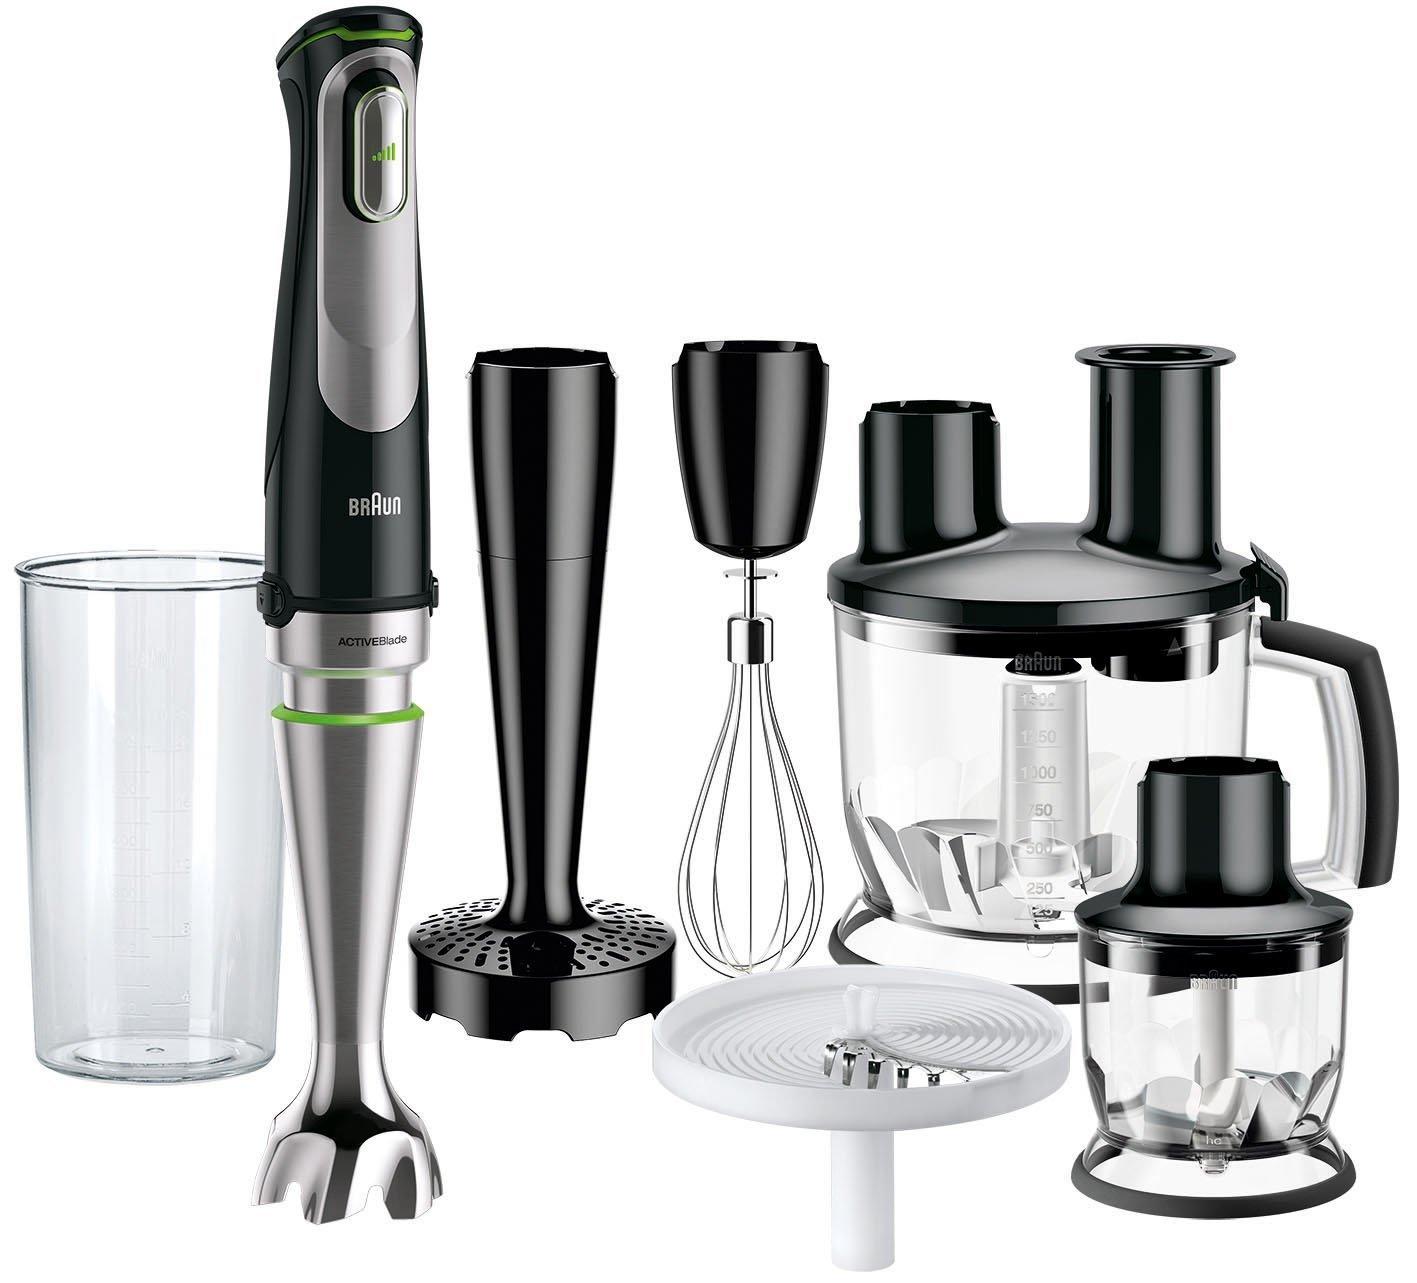 http://www.frullatoreadimmersione.com/wp-content/uploads/2017/05/Braun-Minipimer-MultiQuick-9-MQ-9087X-Gourmet-1.jpg